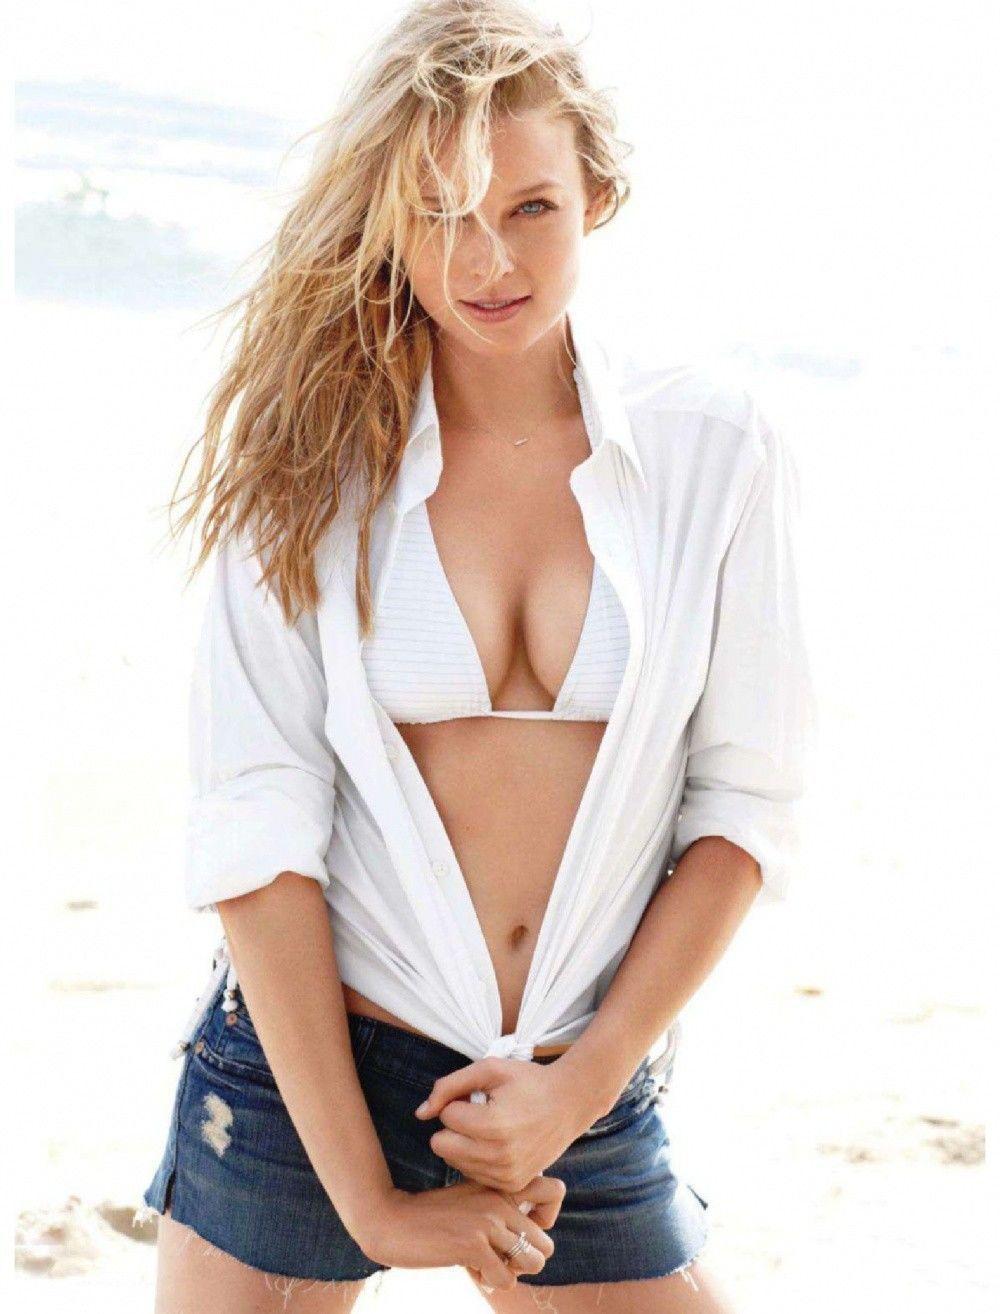 Gianna michaels tits